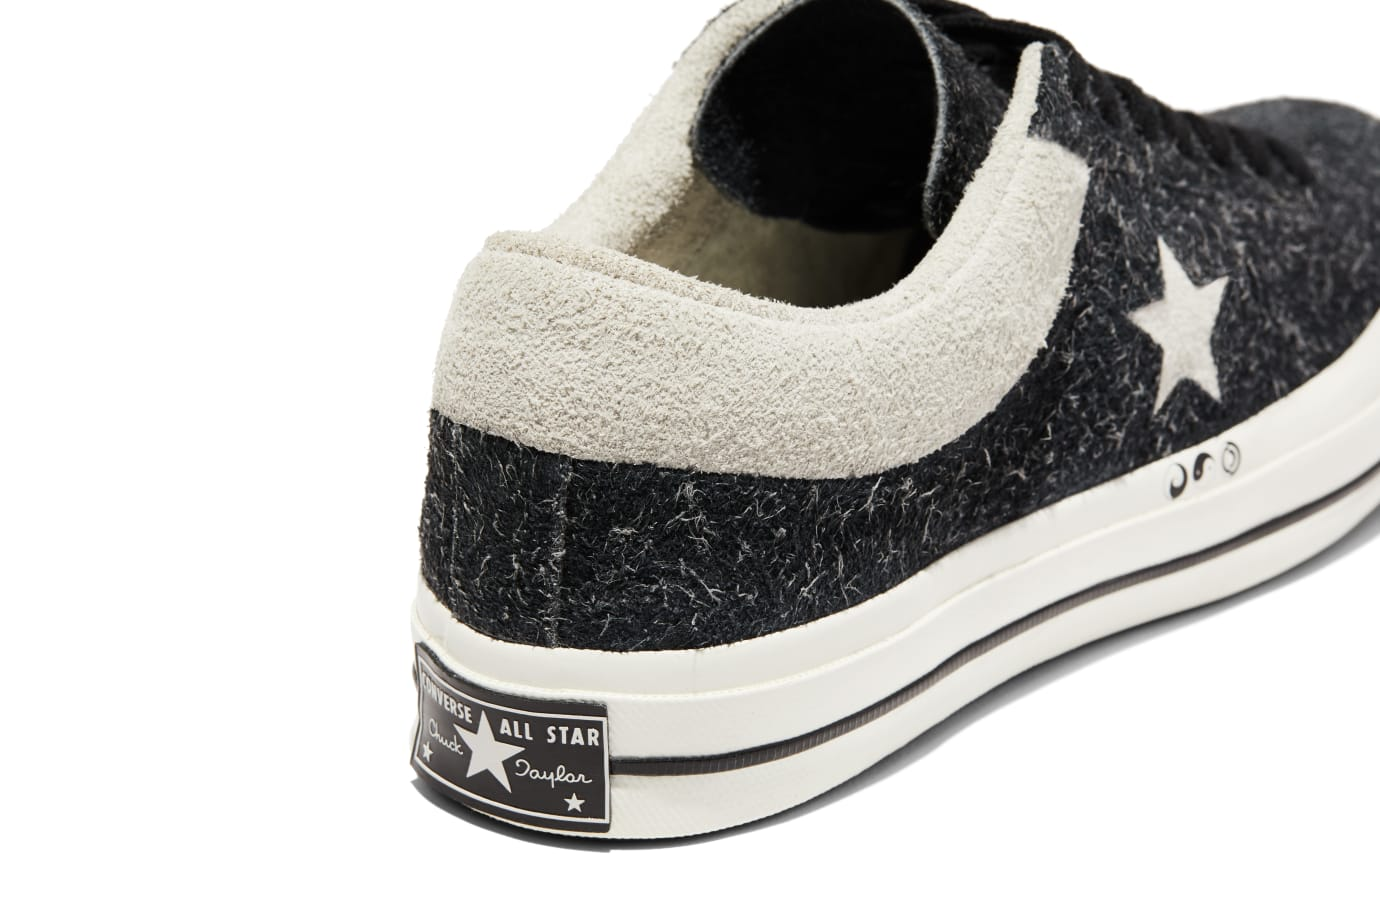 Clot x Converse One Star '74 (Heel2)